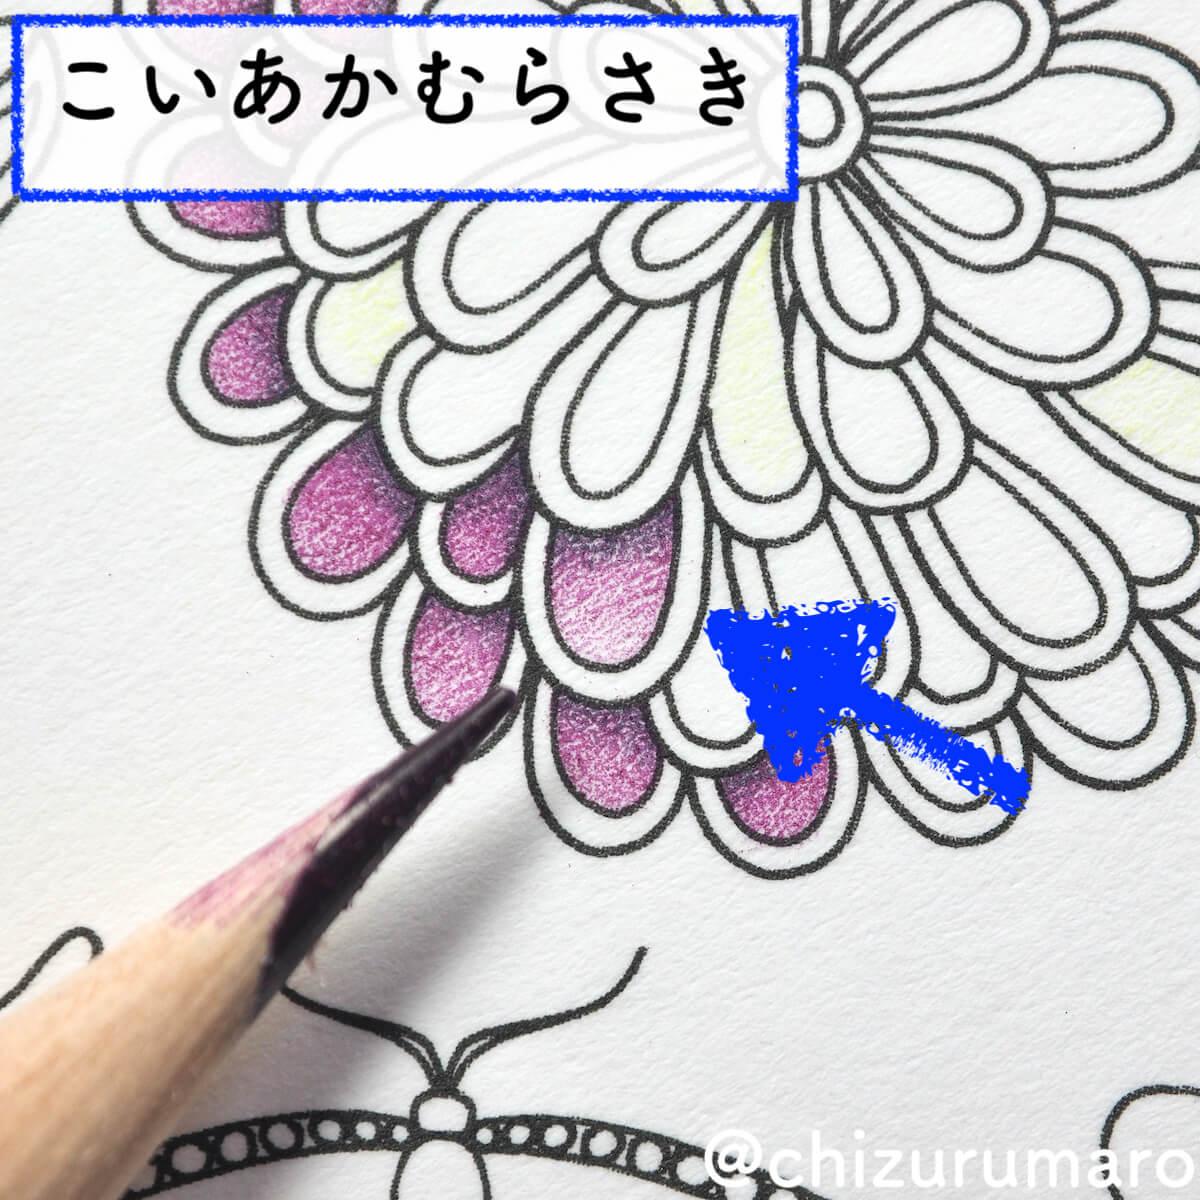 f:id:chizurumaro:20200422152628j:plain